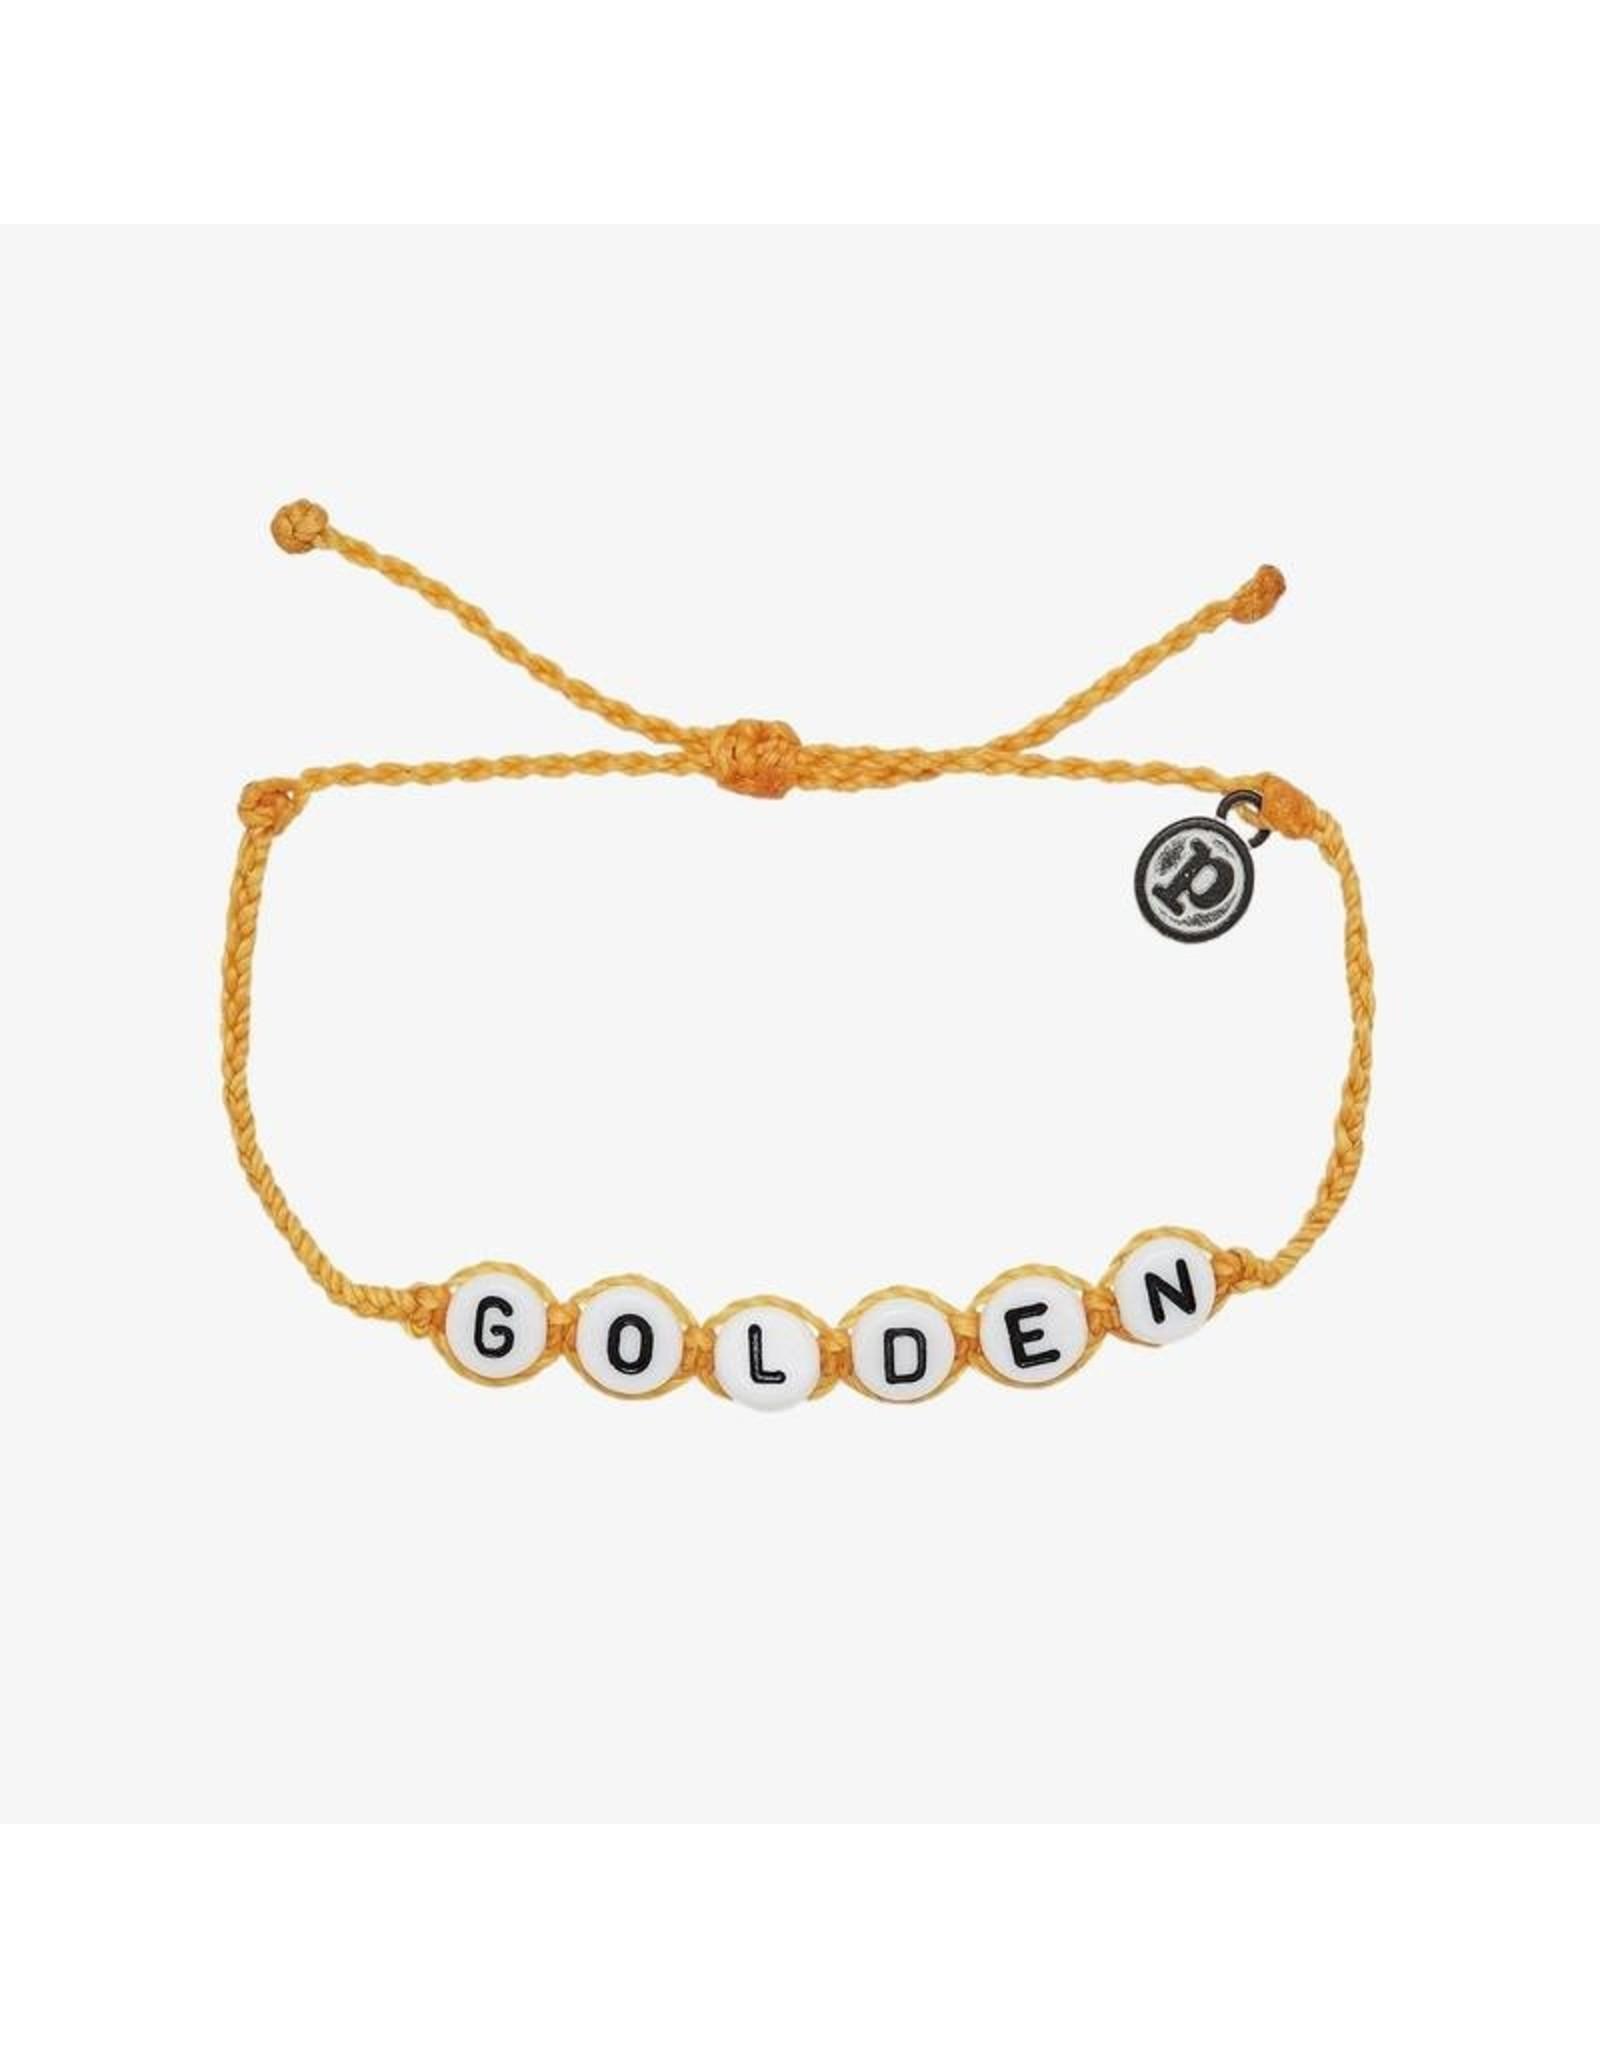 Pura Vida Golden Word Bracelet, Gold